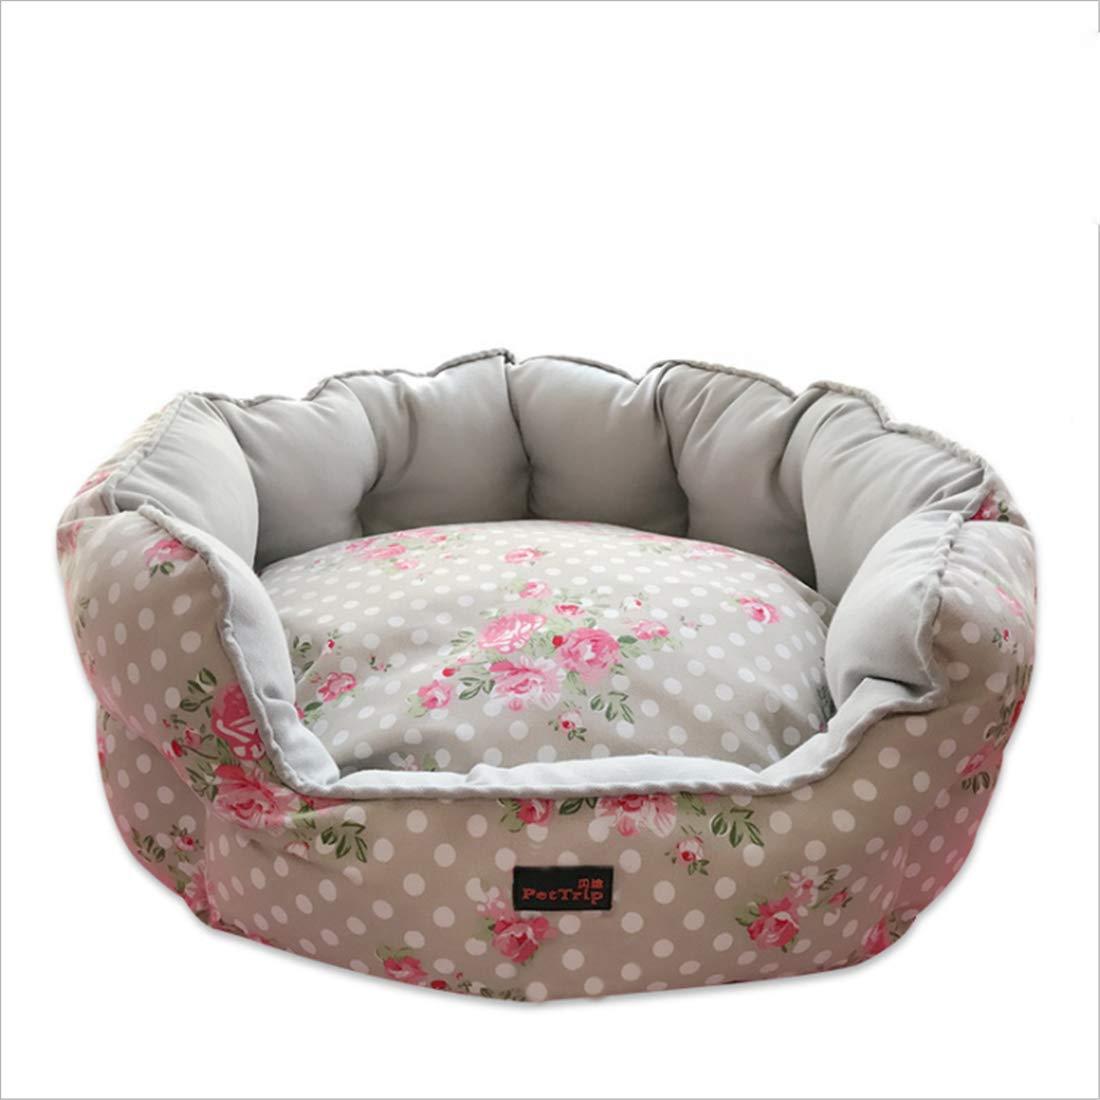 Medium Cute Canvas Kennel Cat Nest Sofa Dog Bed Reversable Cushion Distaccabile Dirt Resistente Morso G  / 2 Sizes